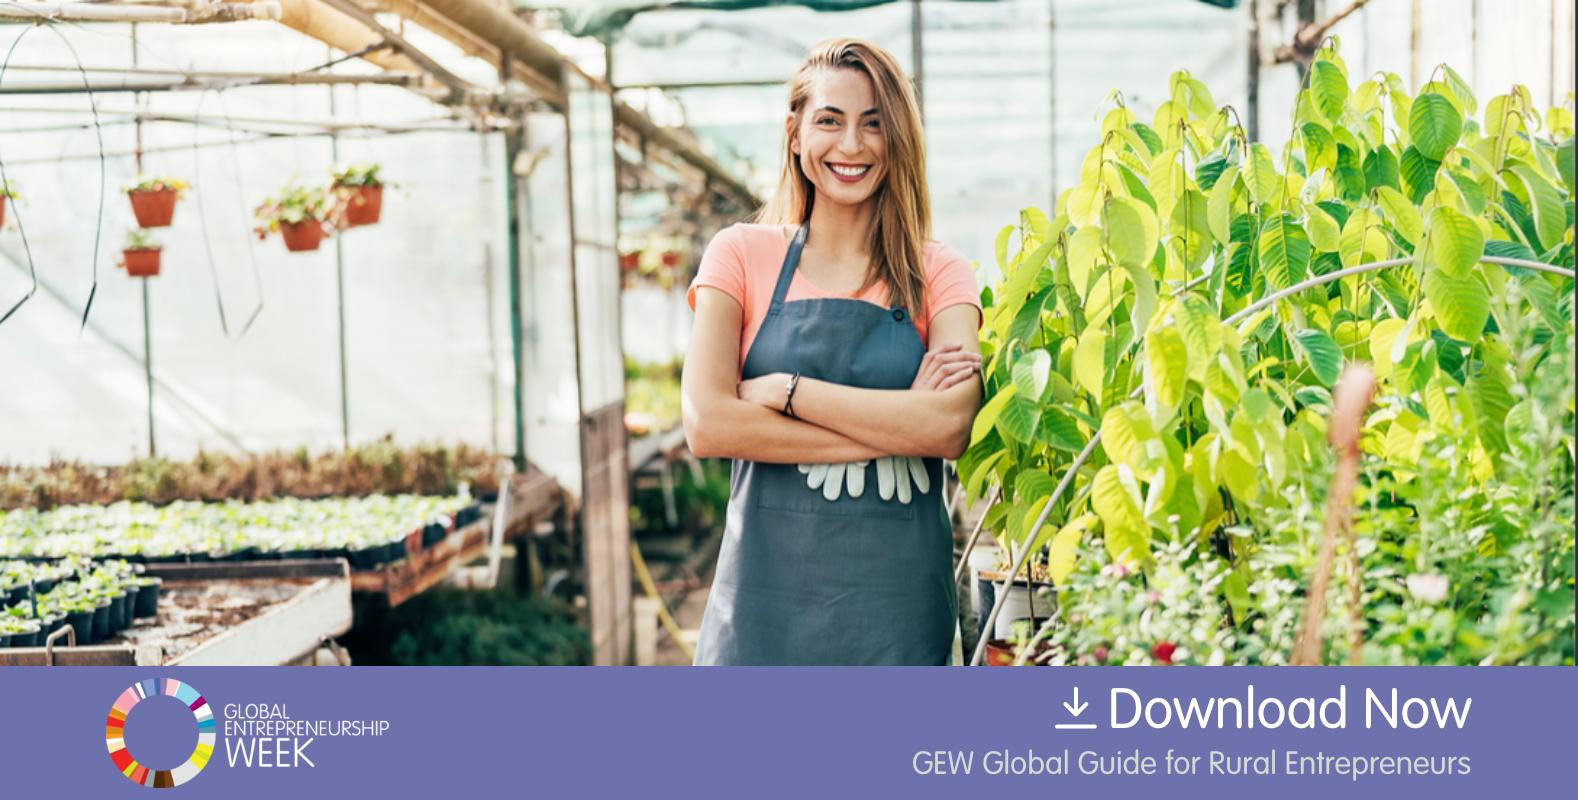 GEW Global Guide for Rural Entrepreneurs